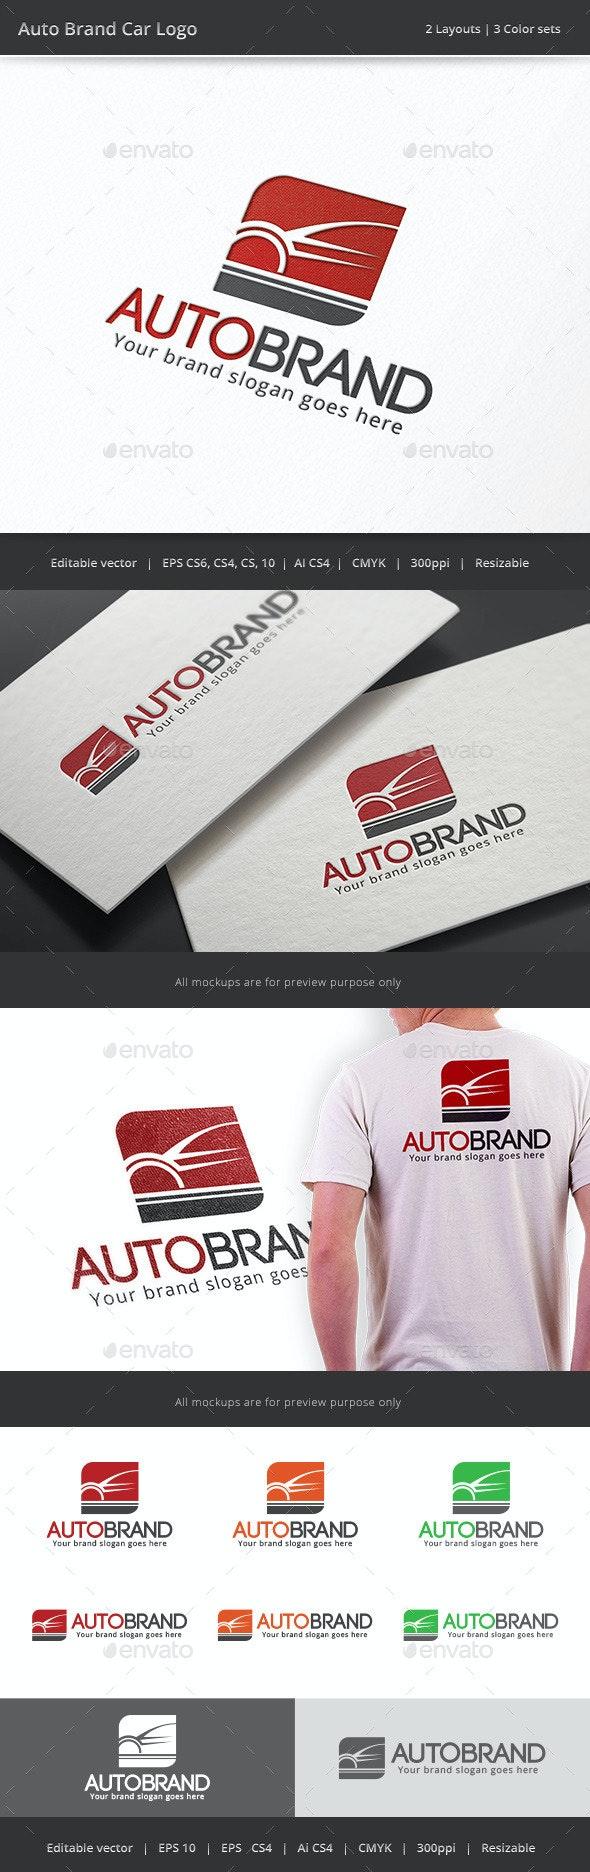 Auto Brand Car Logo - Objects Logo Templates